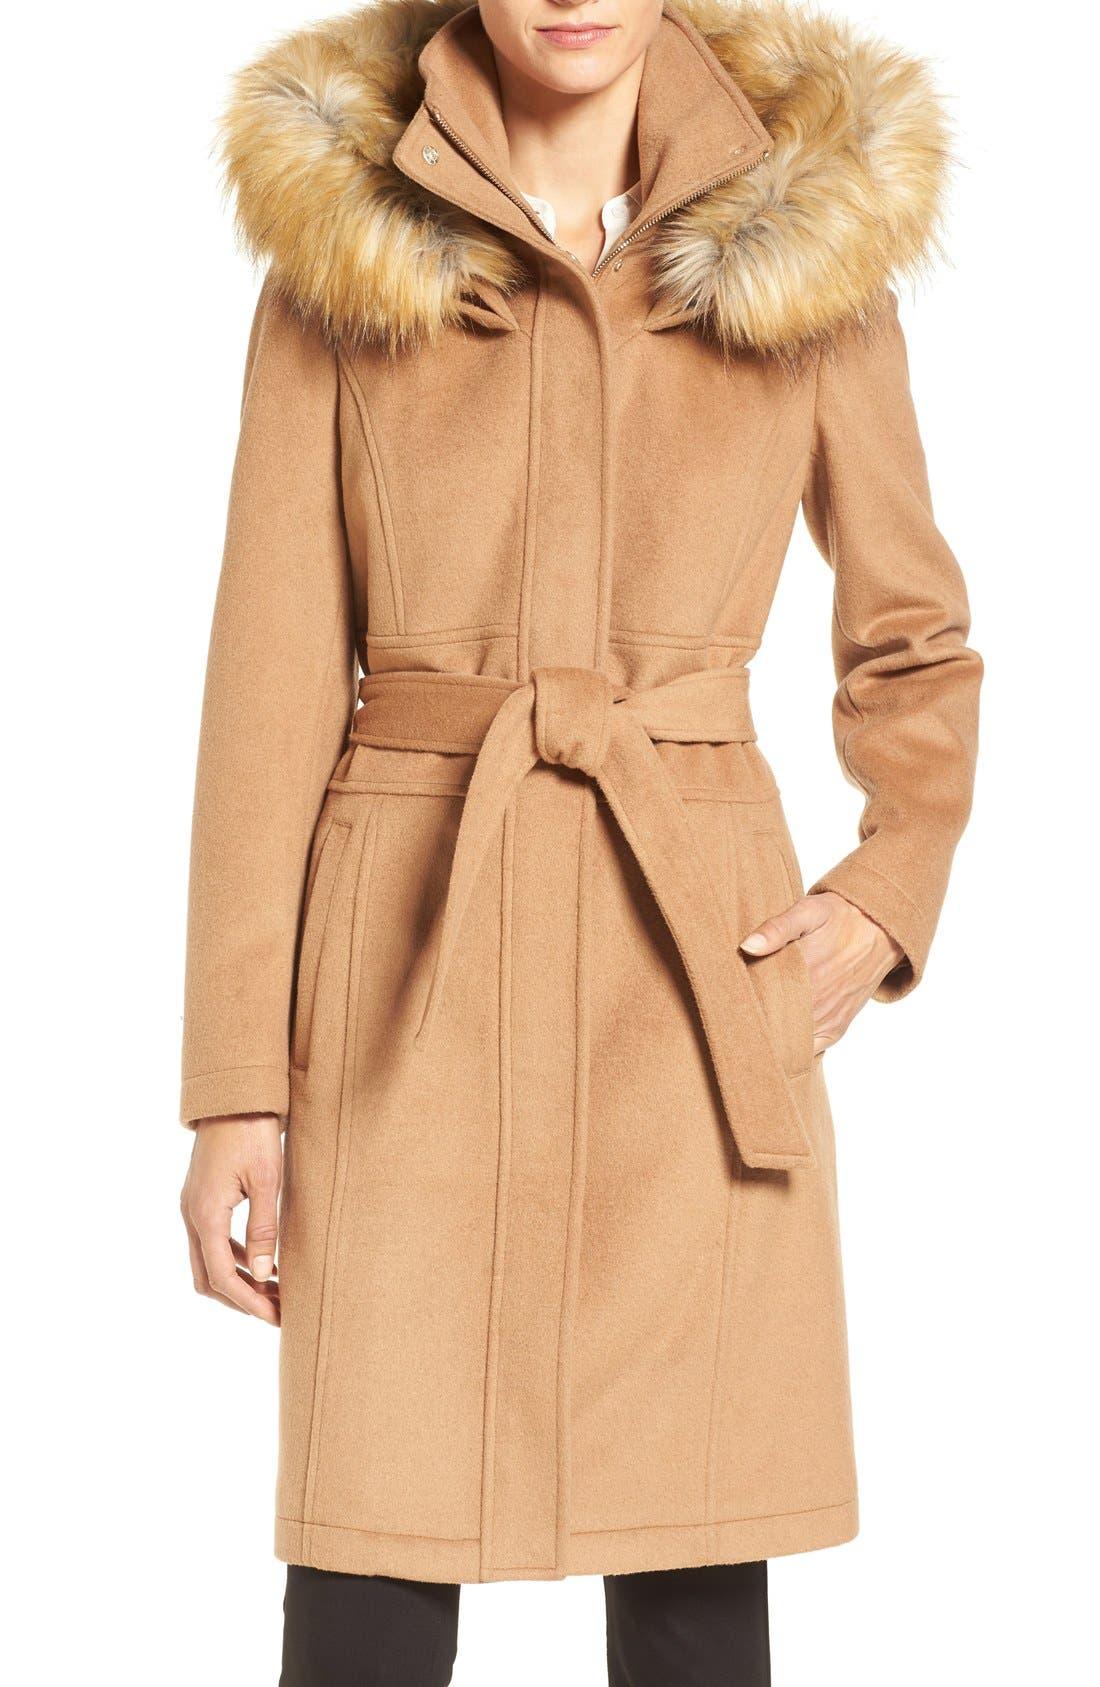 Alternate Image 1 Selected - Ivanka Trump Wool Blend Coat with Removable Faux Fur Trim Hood